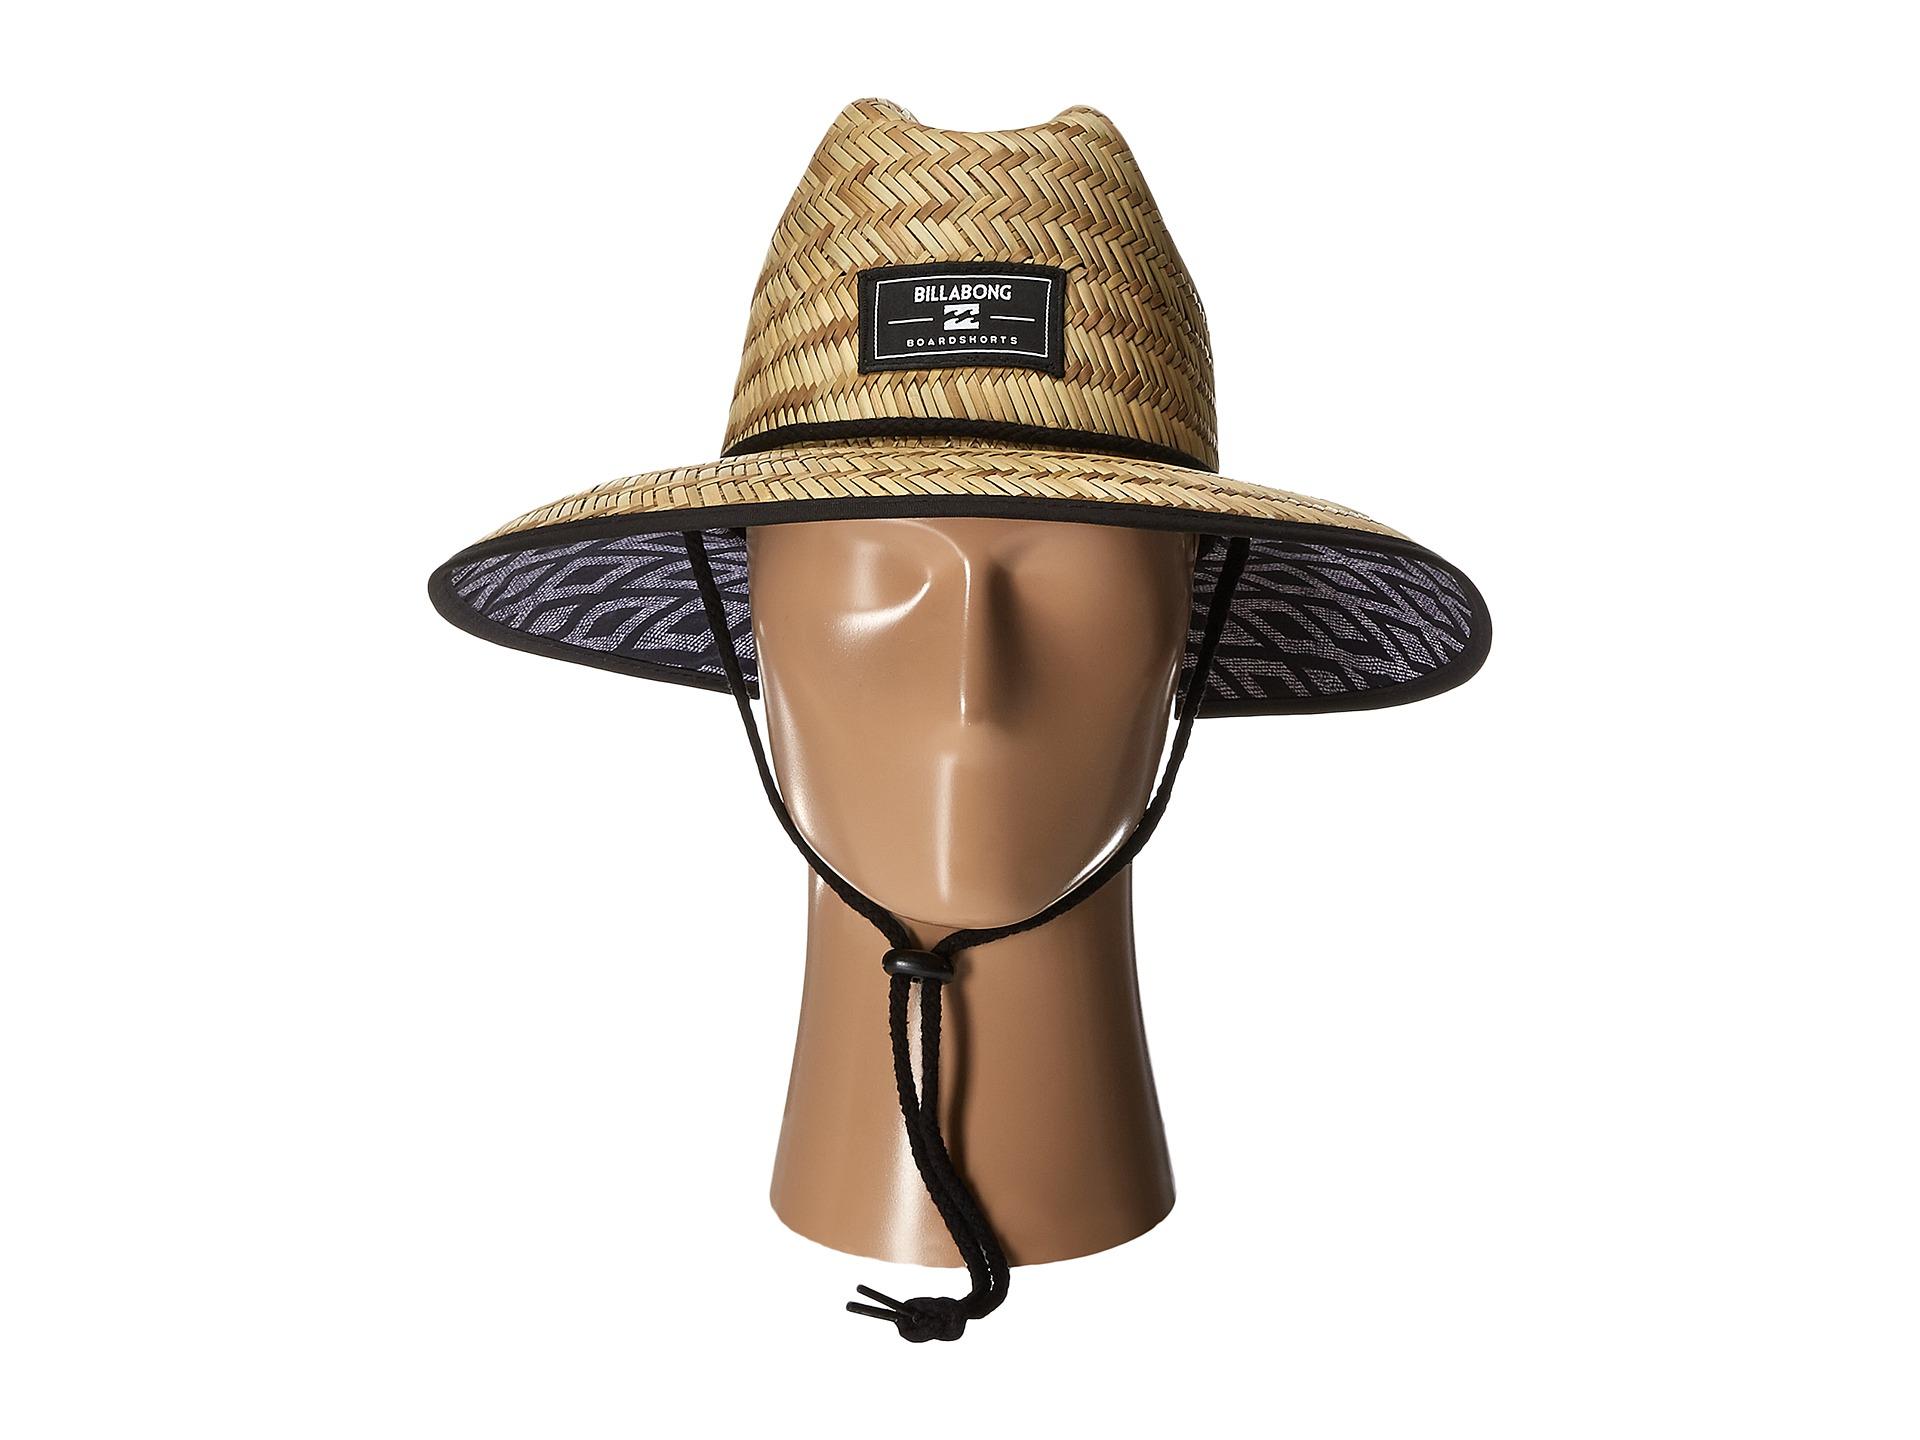 eaae7745ec8da ... czech walled trucker hat black lyst billabong brolock hat in natural  for men 6be49 edd52